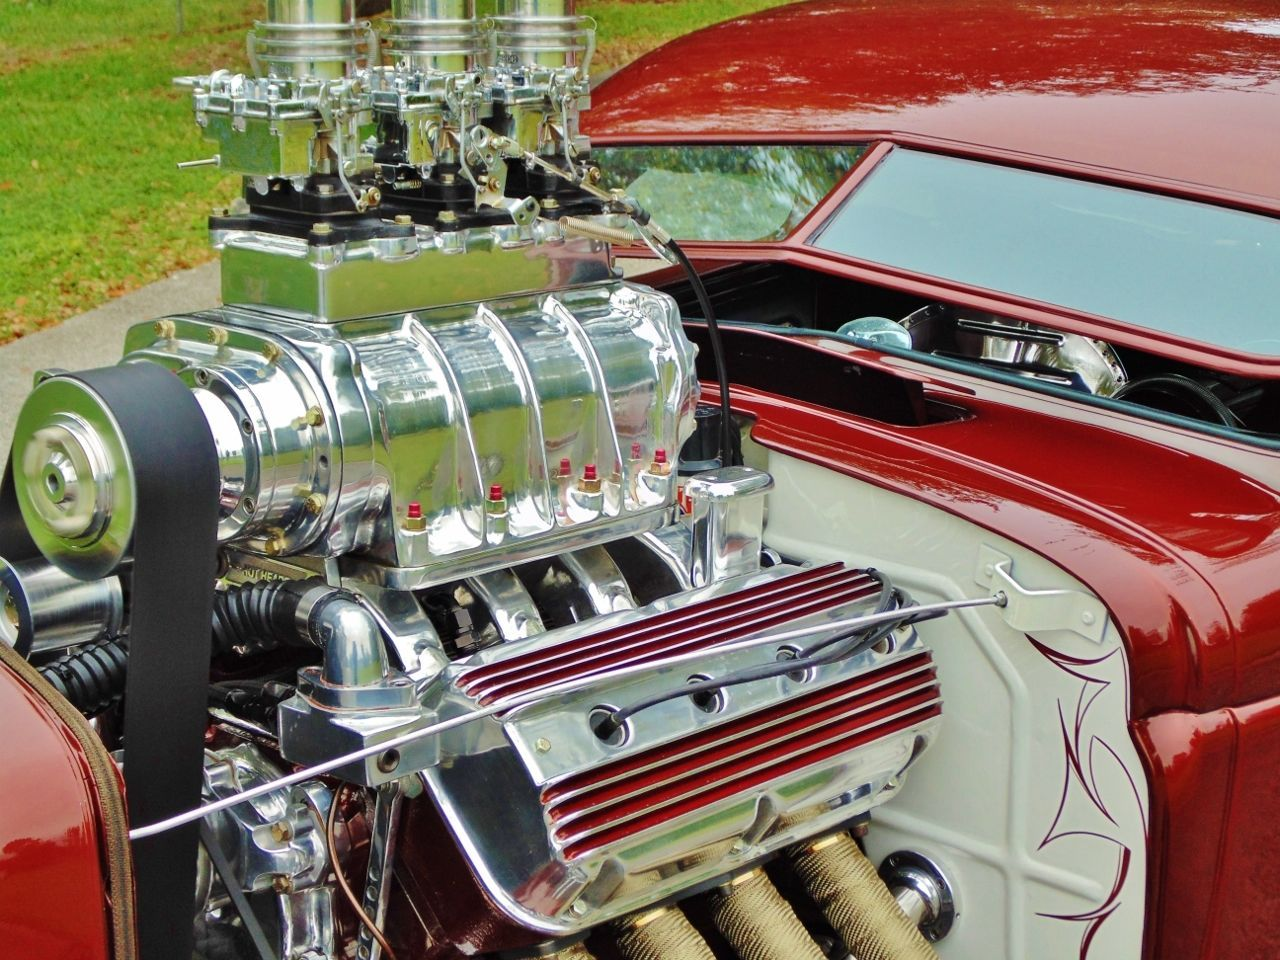 1940 Dodge Power Wagon HOT ROD RAT ROD SHOW CAR Blown HEMI ...